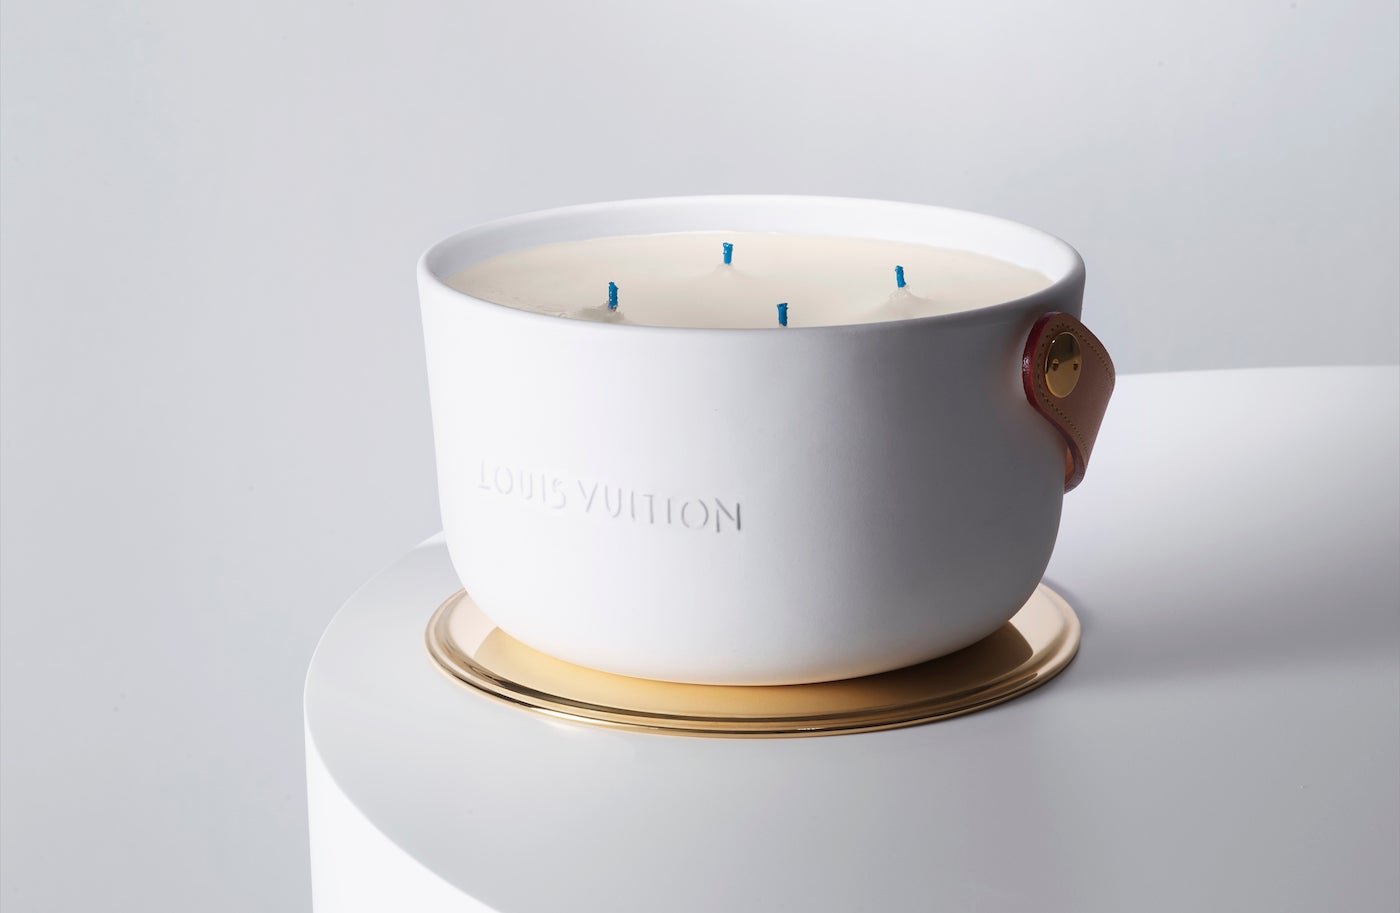 Vonná svíčka Île Blanche (1,1 kg), Louis Vuitton, 550 €